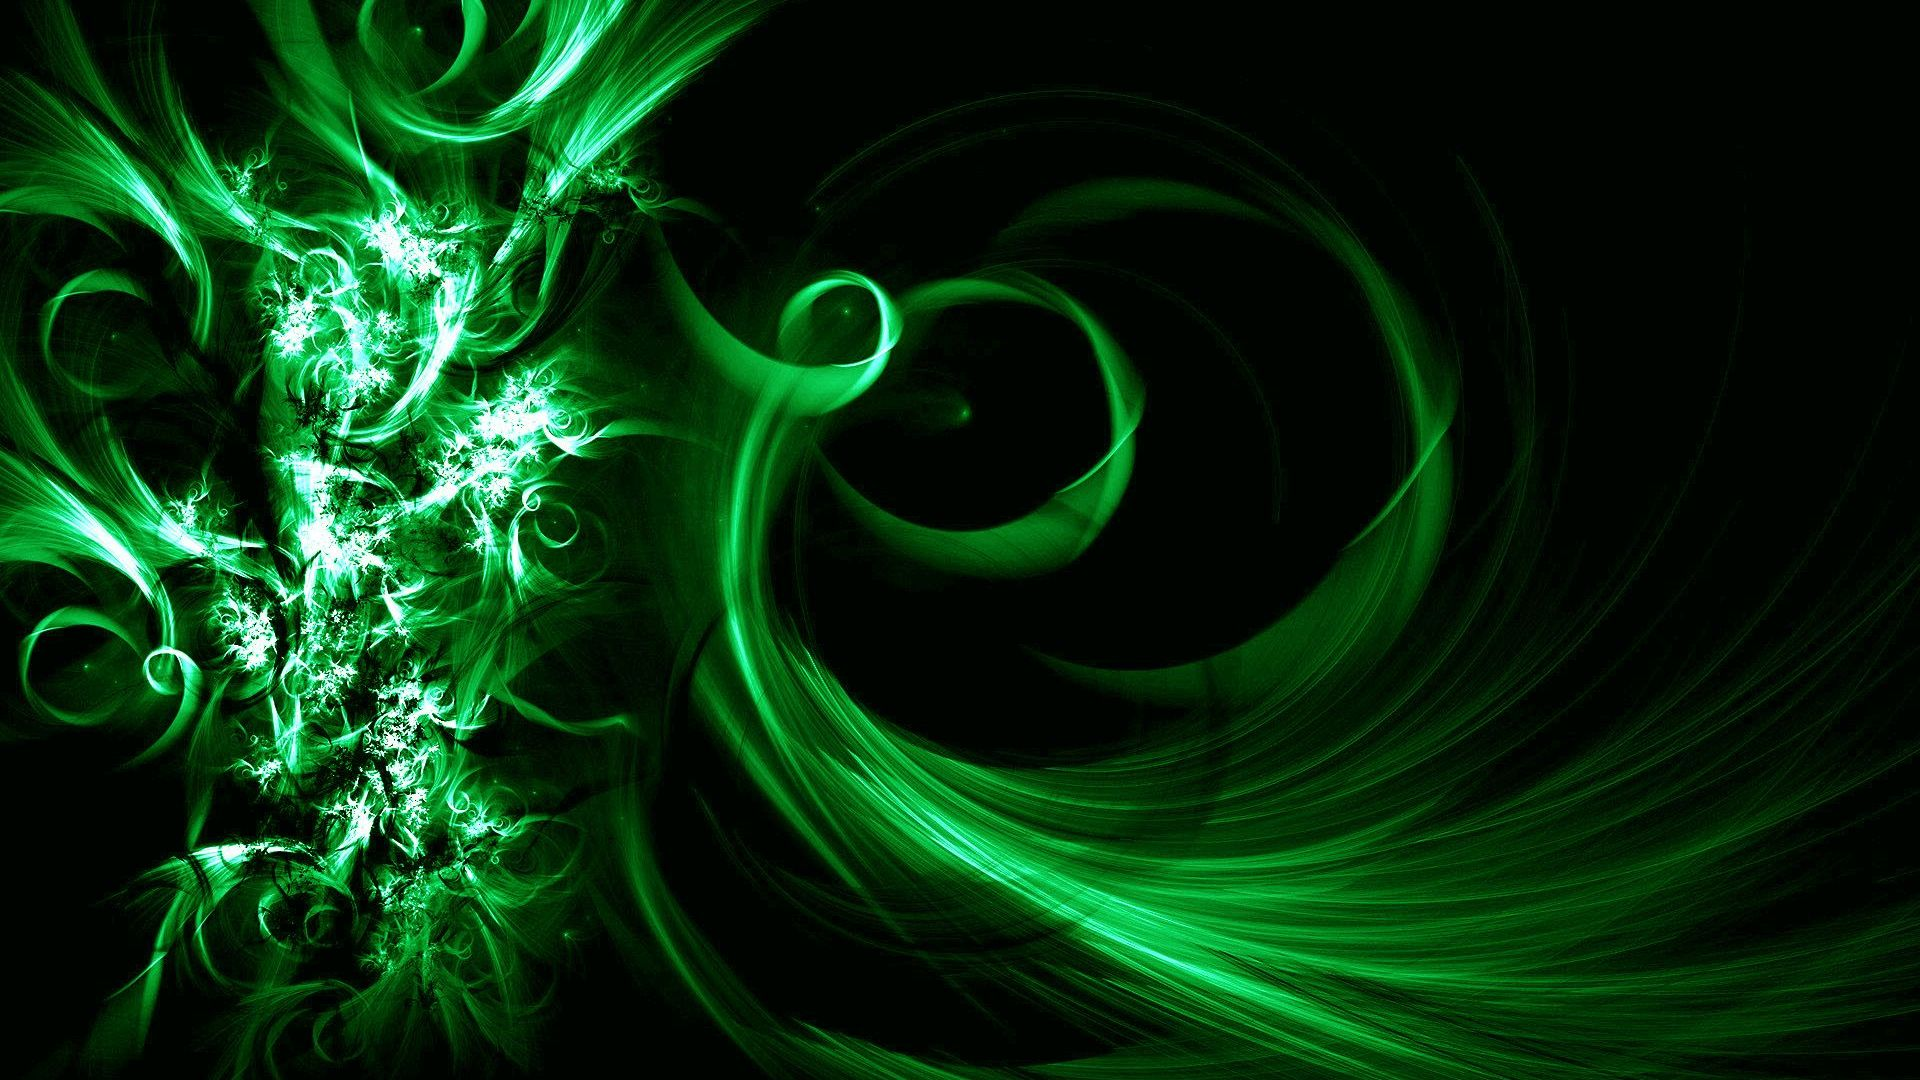 1920x1080 green wallpaper: Green Glow Wallpaper